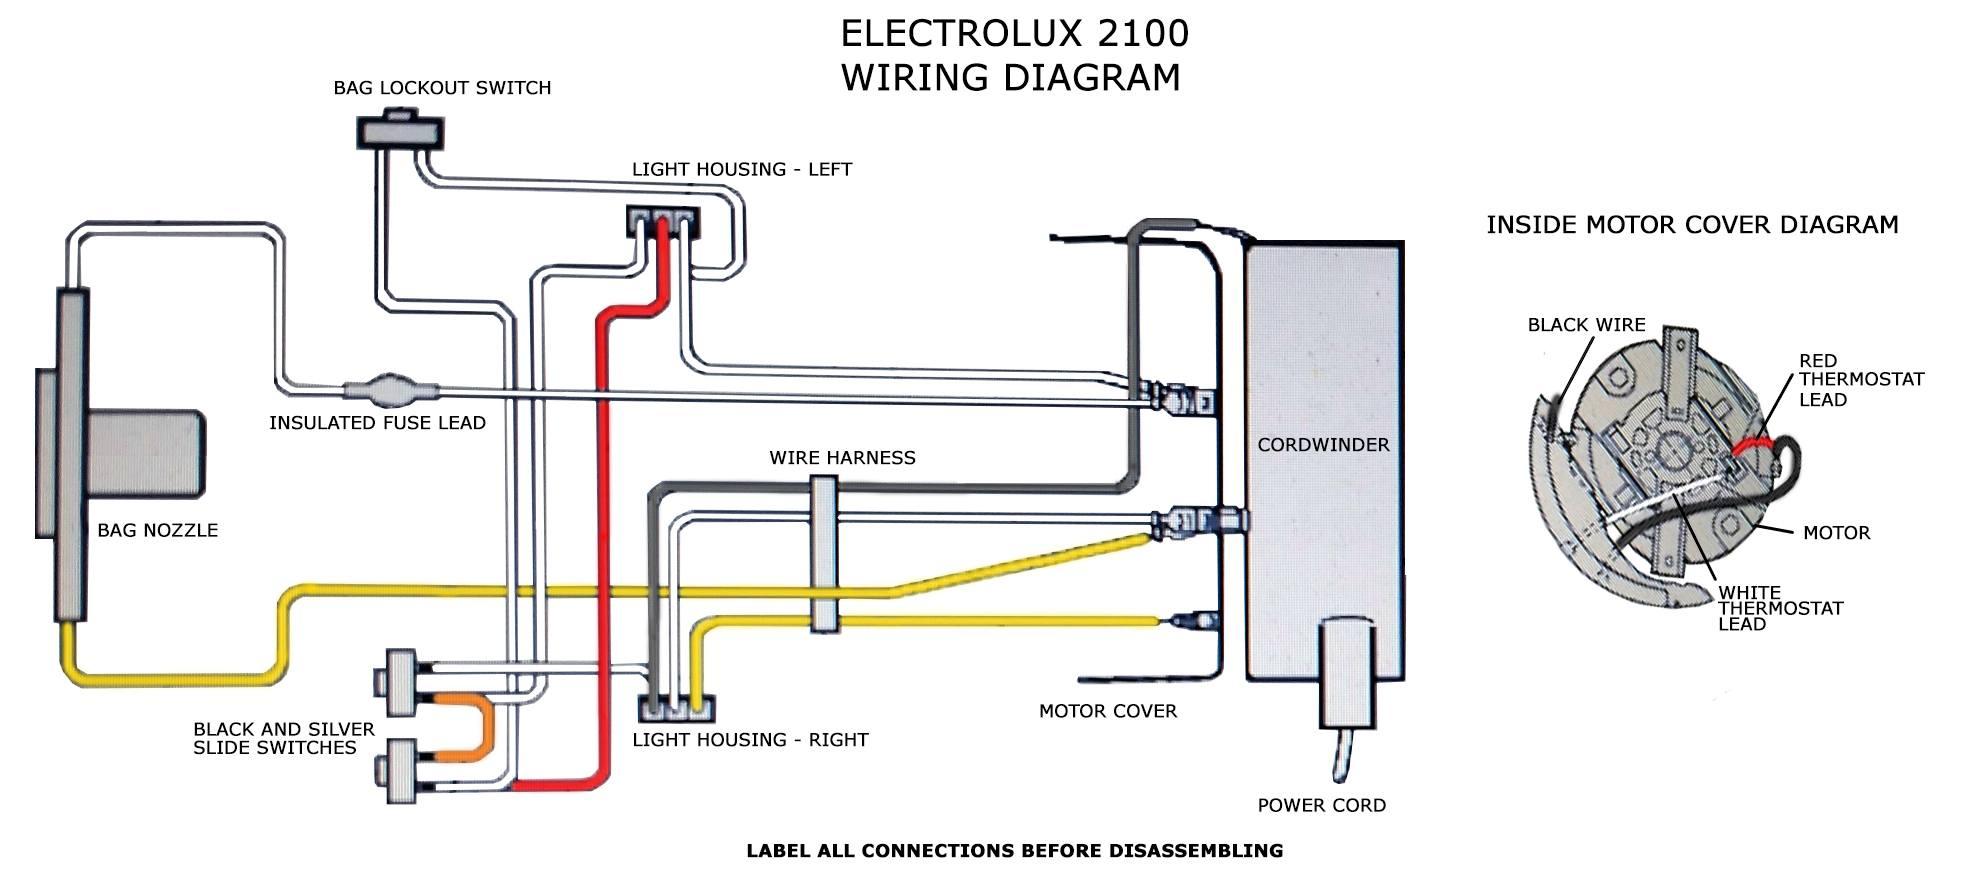 oreck wiring diagram wiring diagram Oreck Vacuum Wiring Diagram